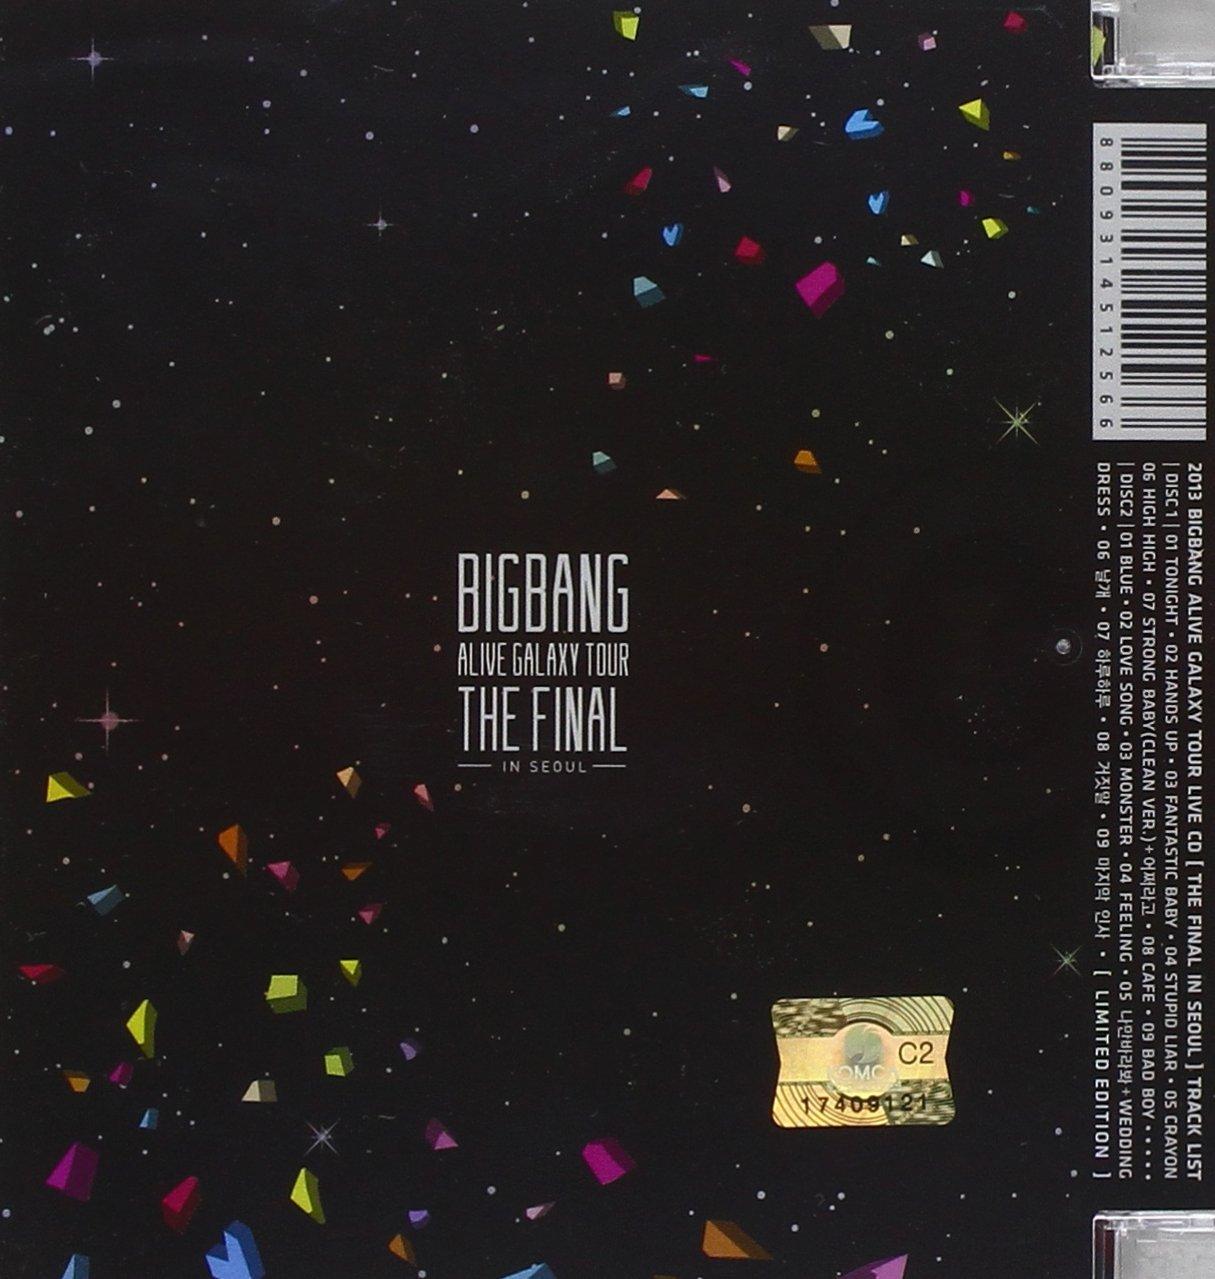 2013 Bigbang Alive Galaxy Tour Live